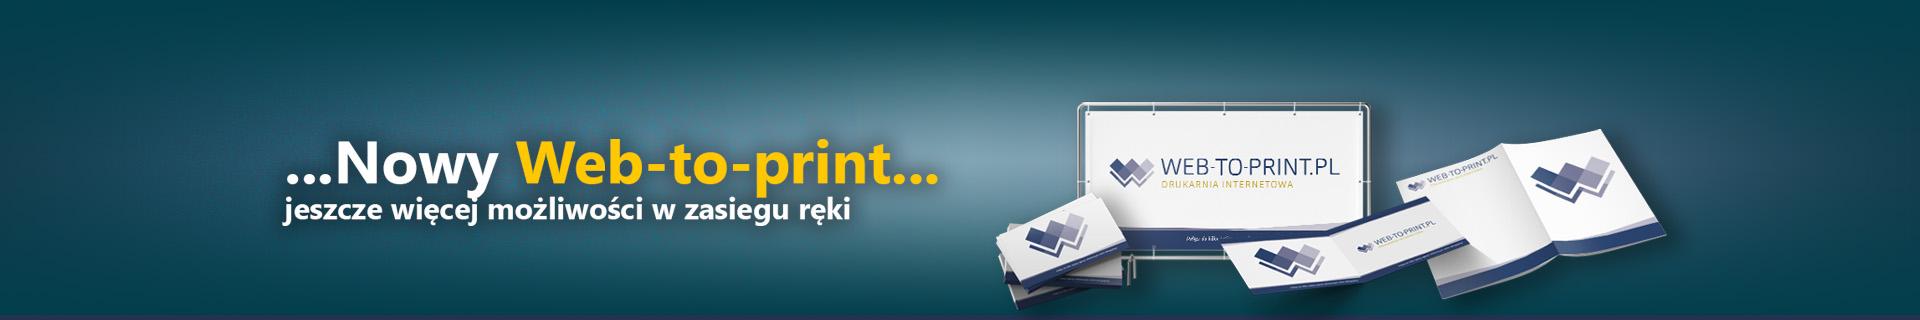 Drukarnia internetowa - Web-To-Print.pl